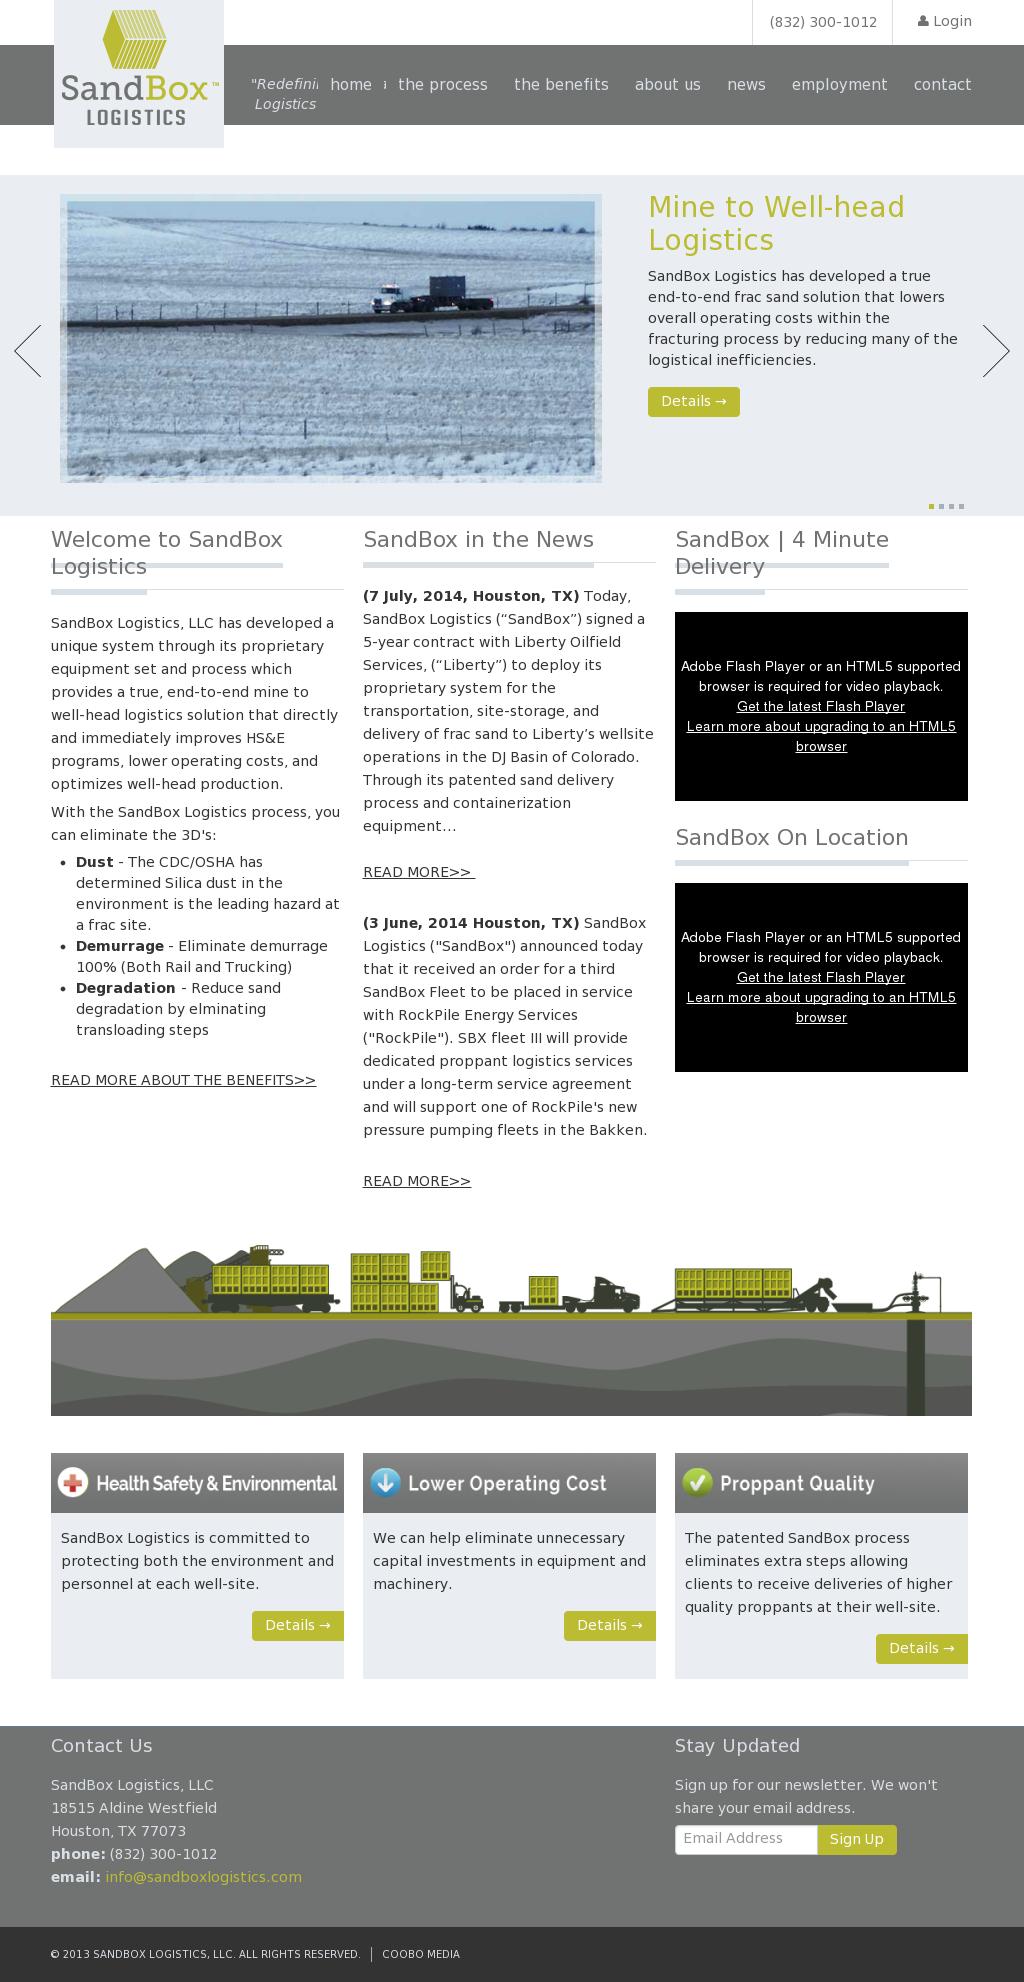 SandBox Logistics Competitors, Revenue and Employees - Owler